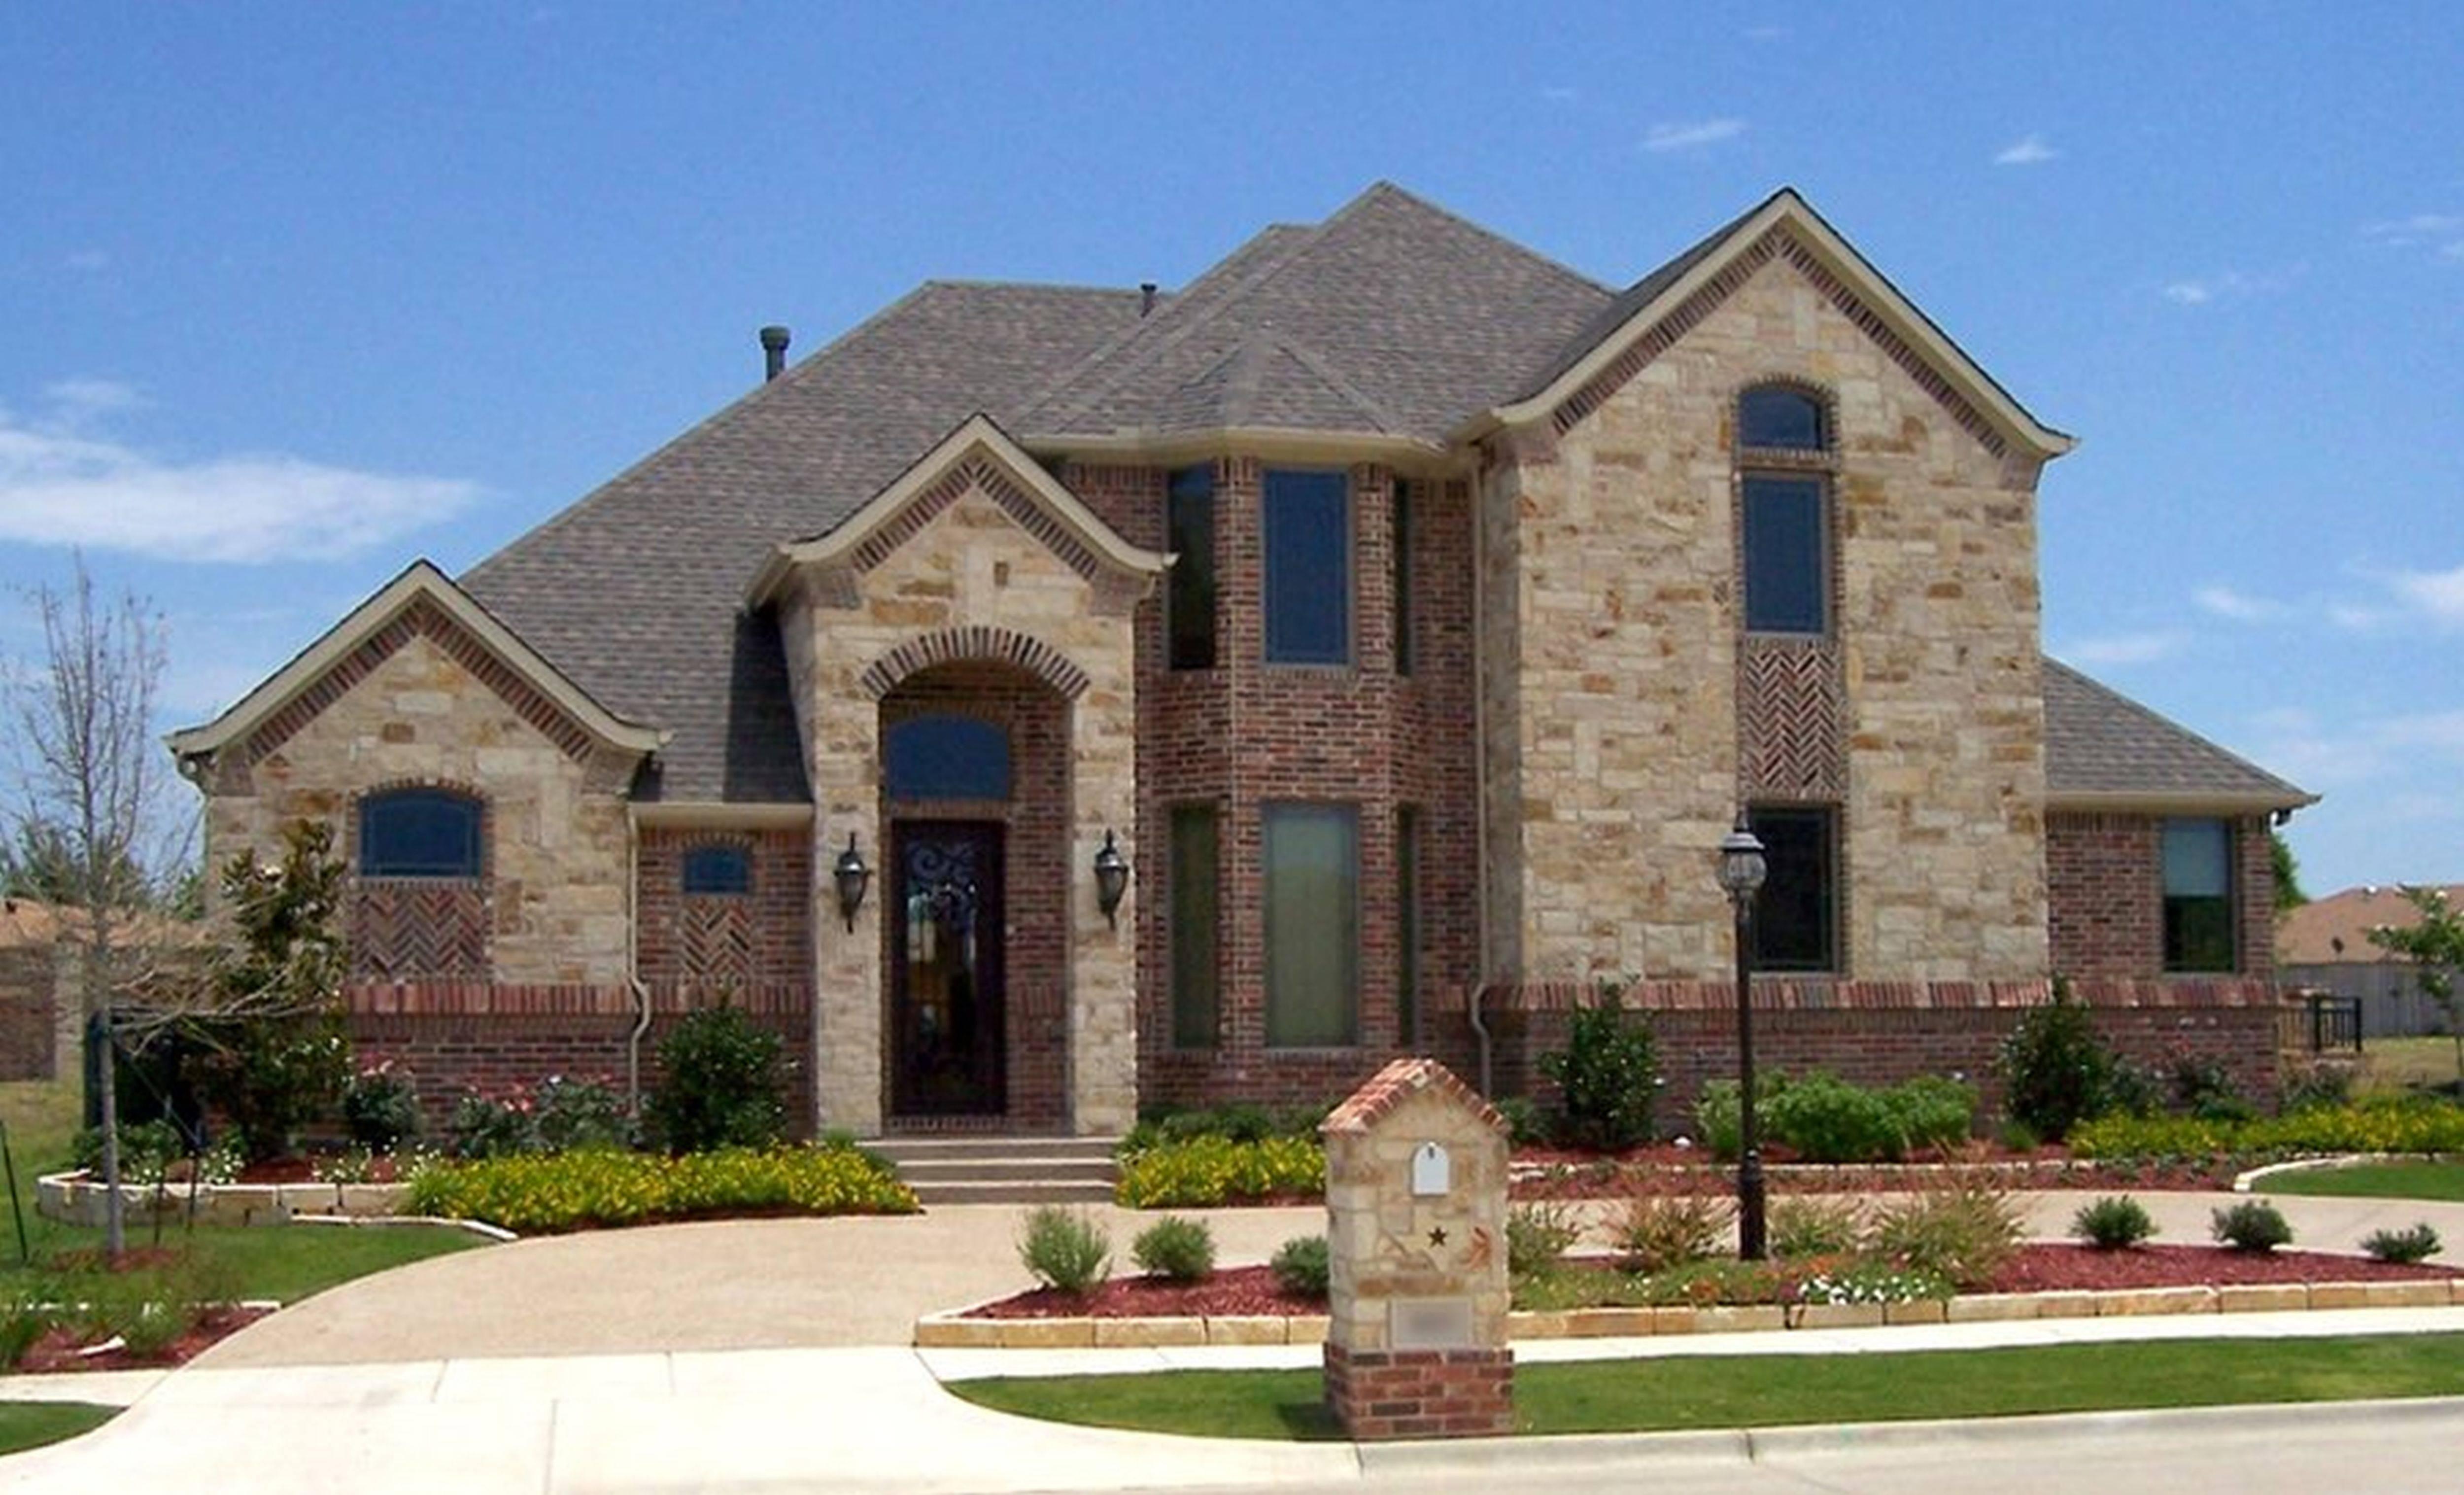 Minecraft Best Modern House Ever Design Home Plans Blueprints 30328